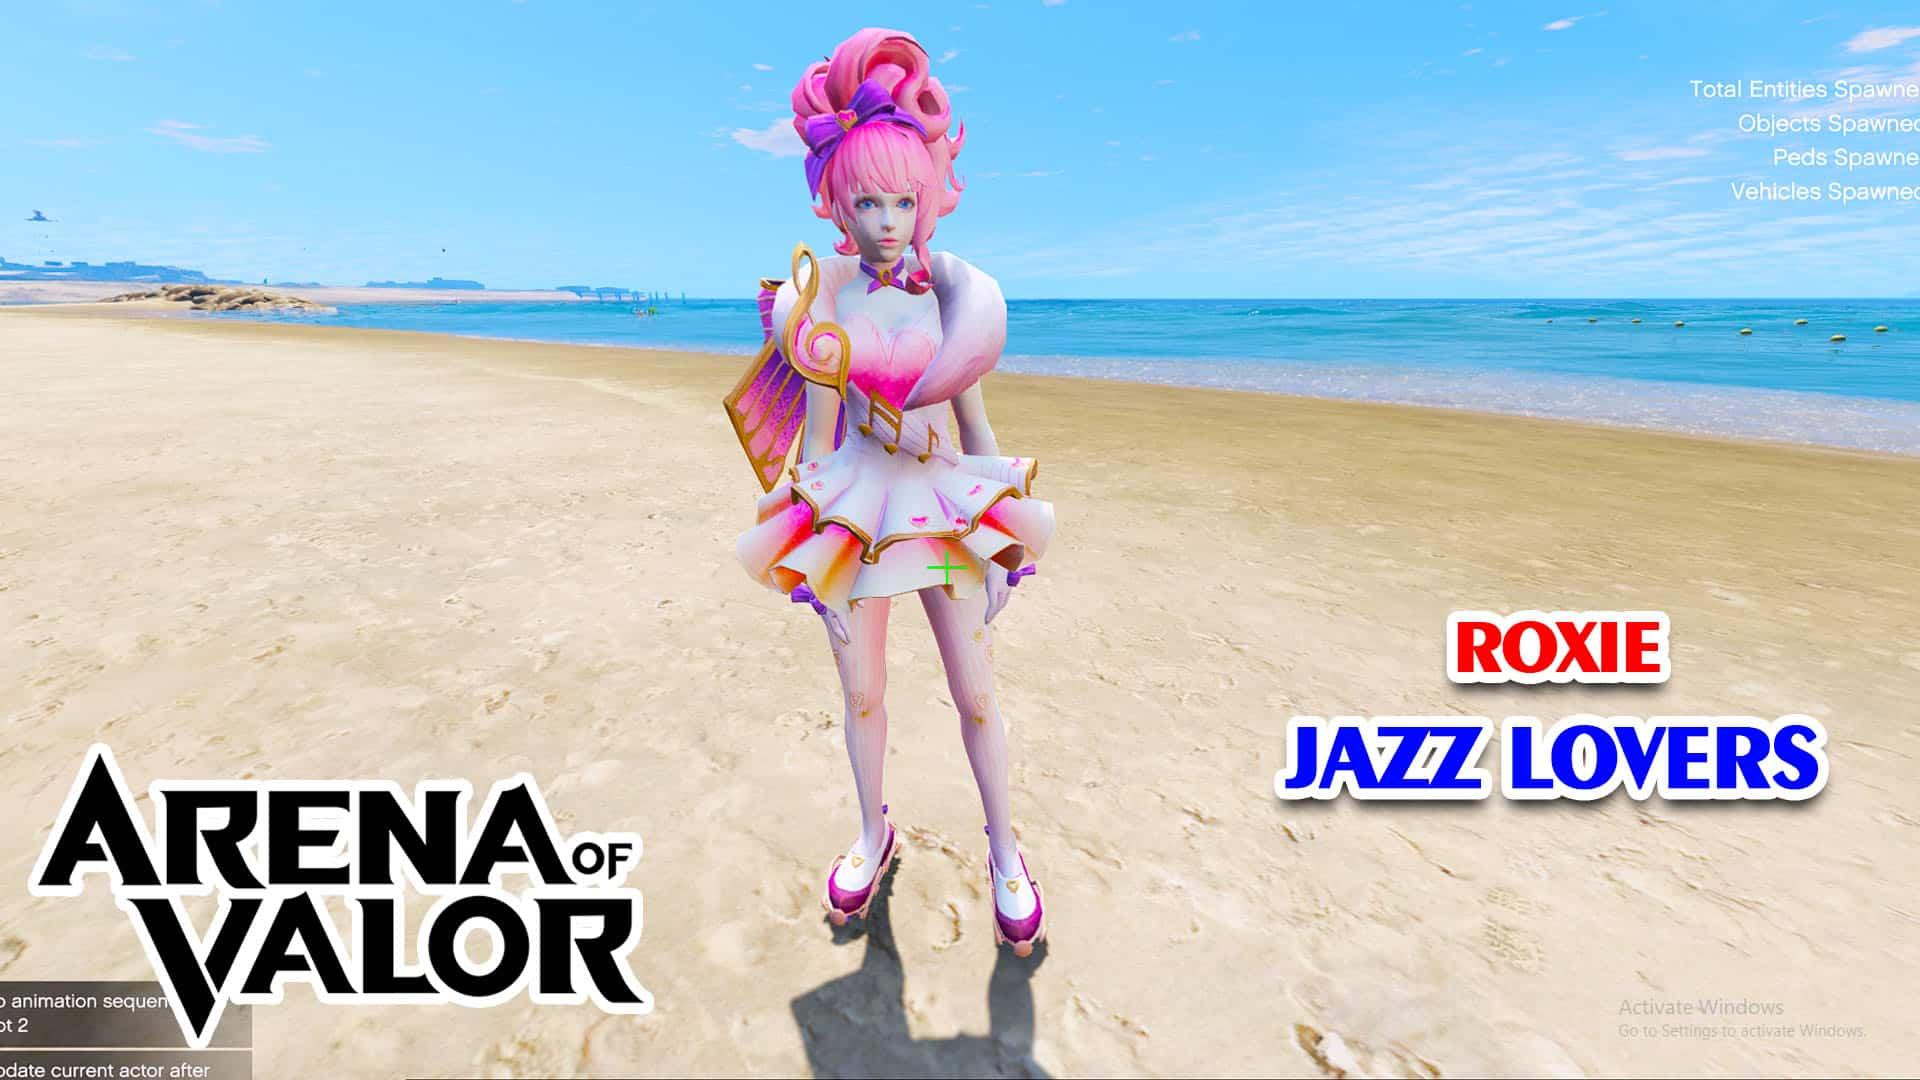 GTA 5 Mod Roxie Jazz Lovers Arena of Valor